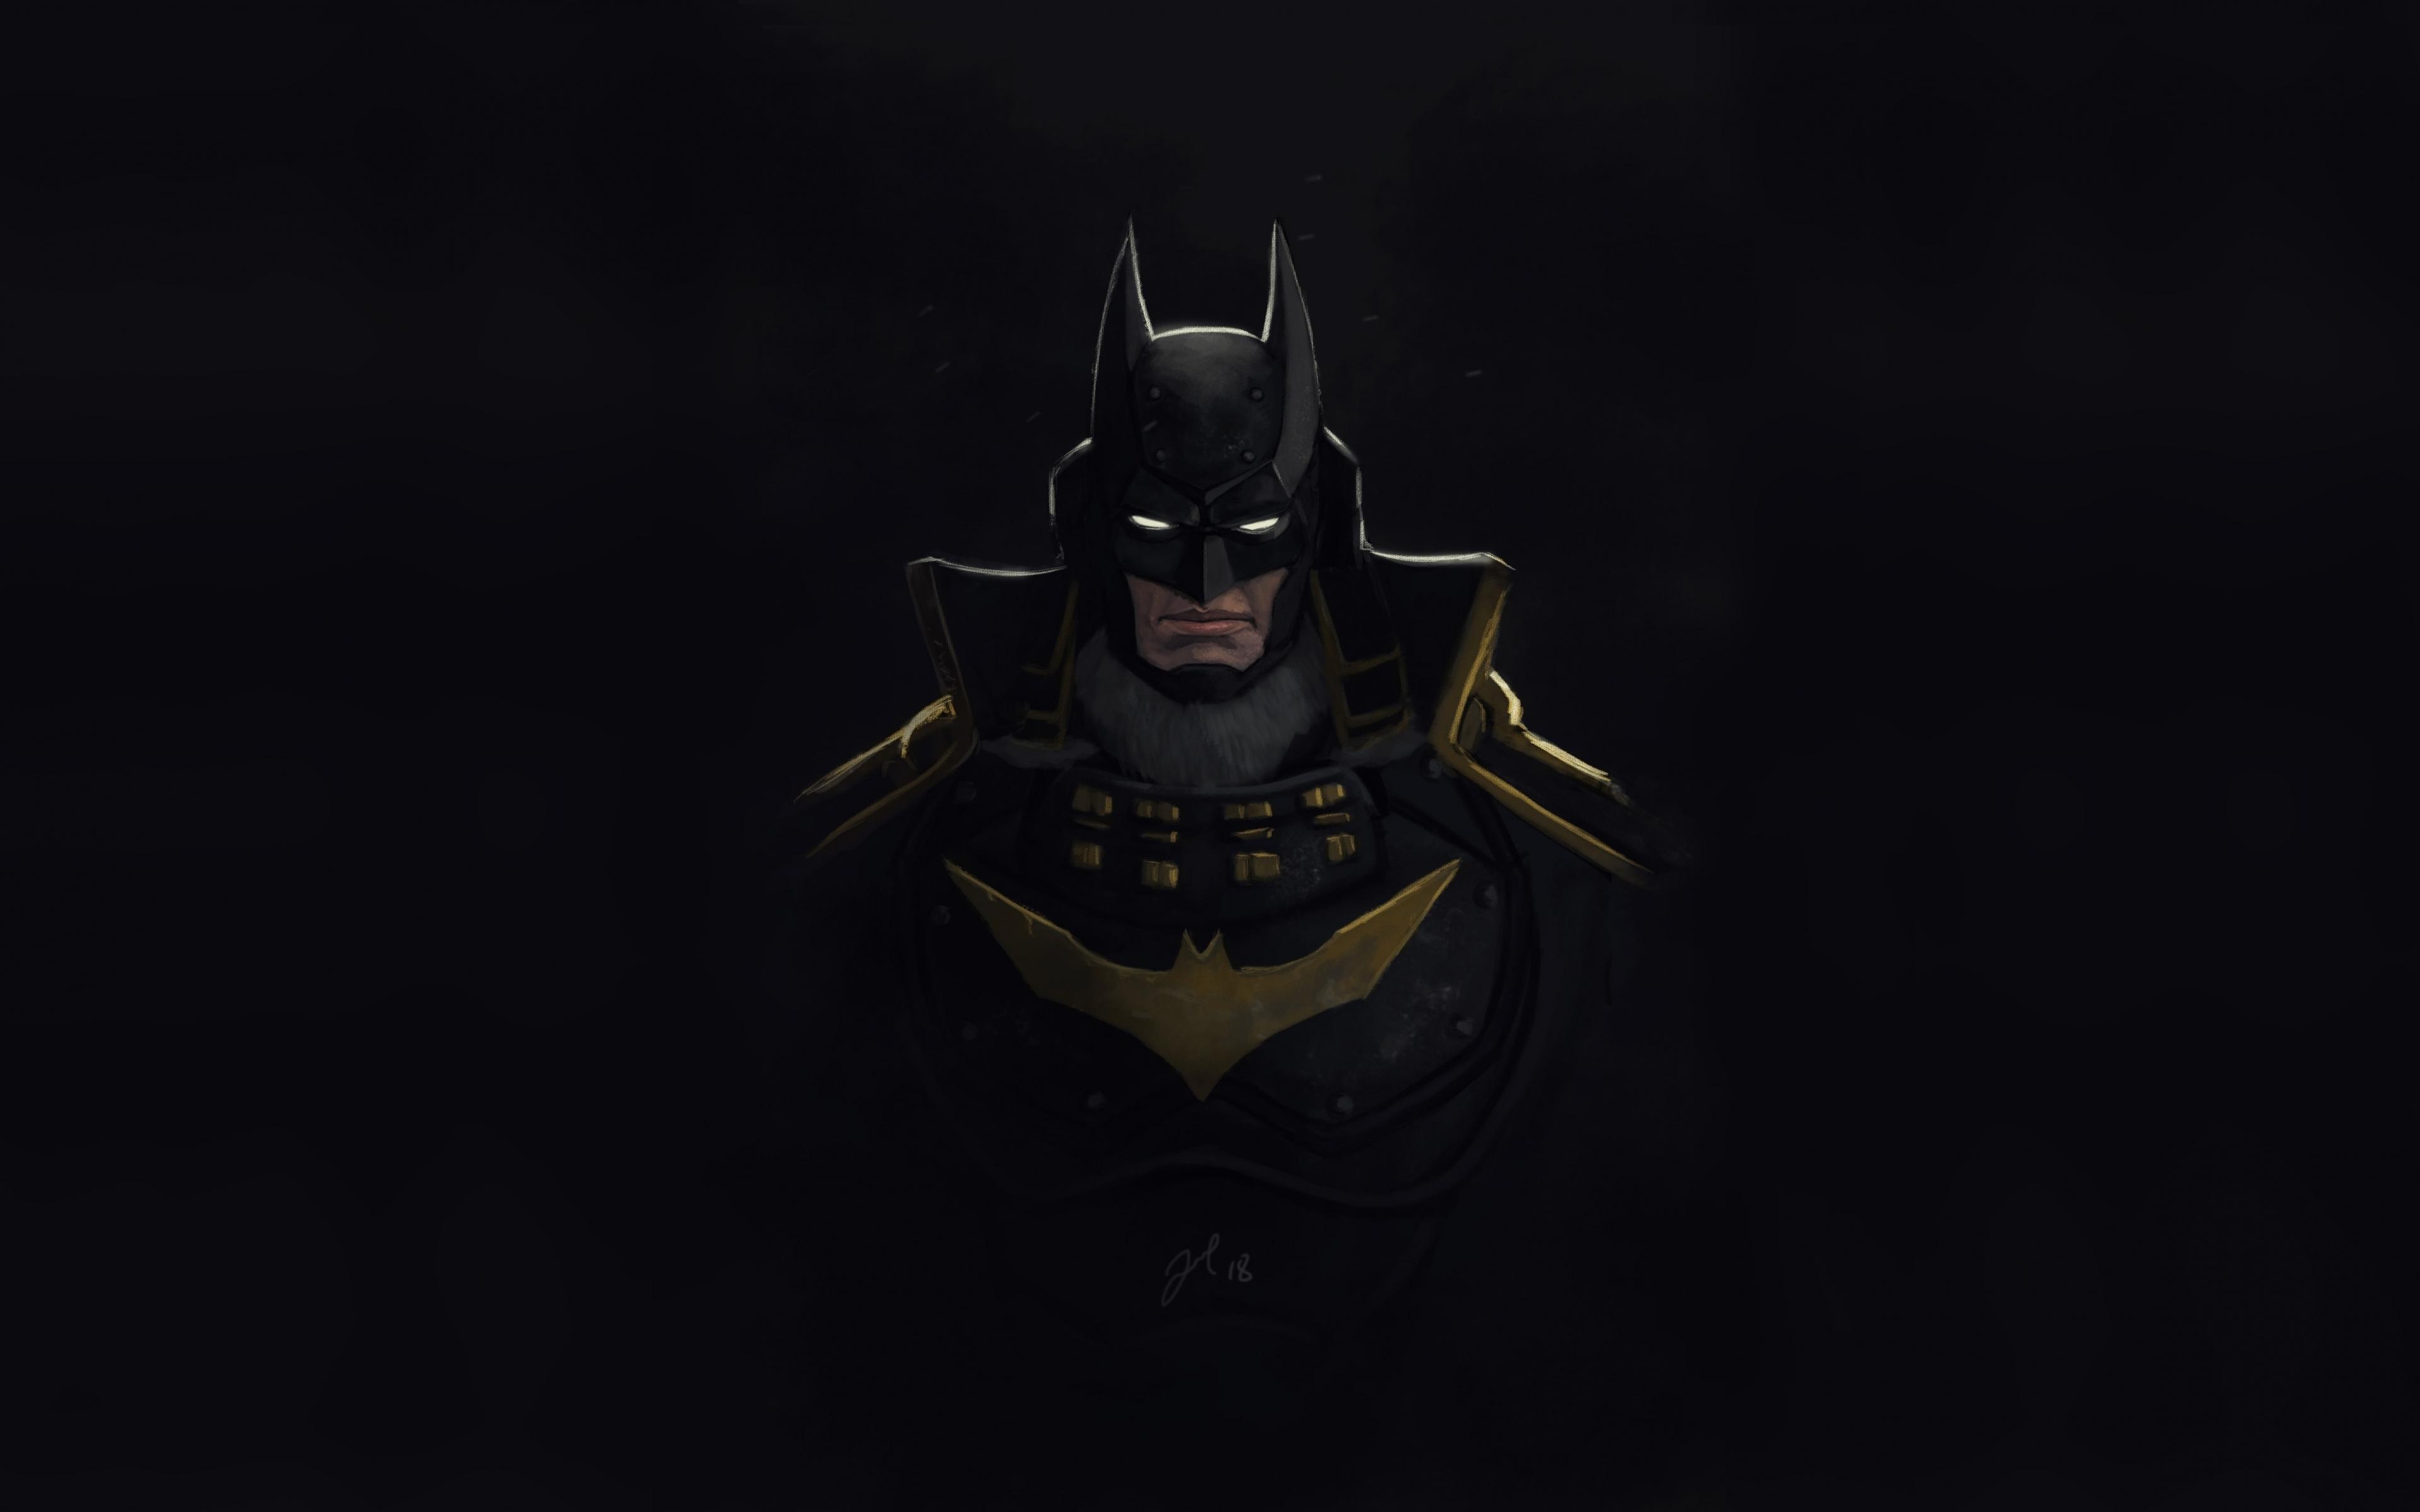 batman ninja download full movie